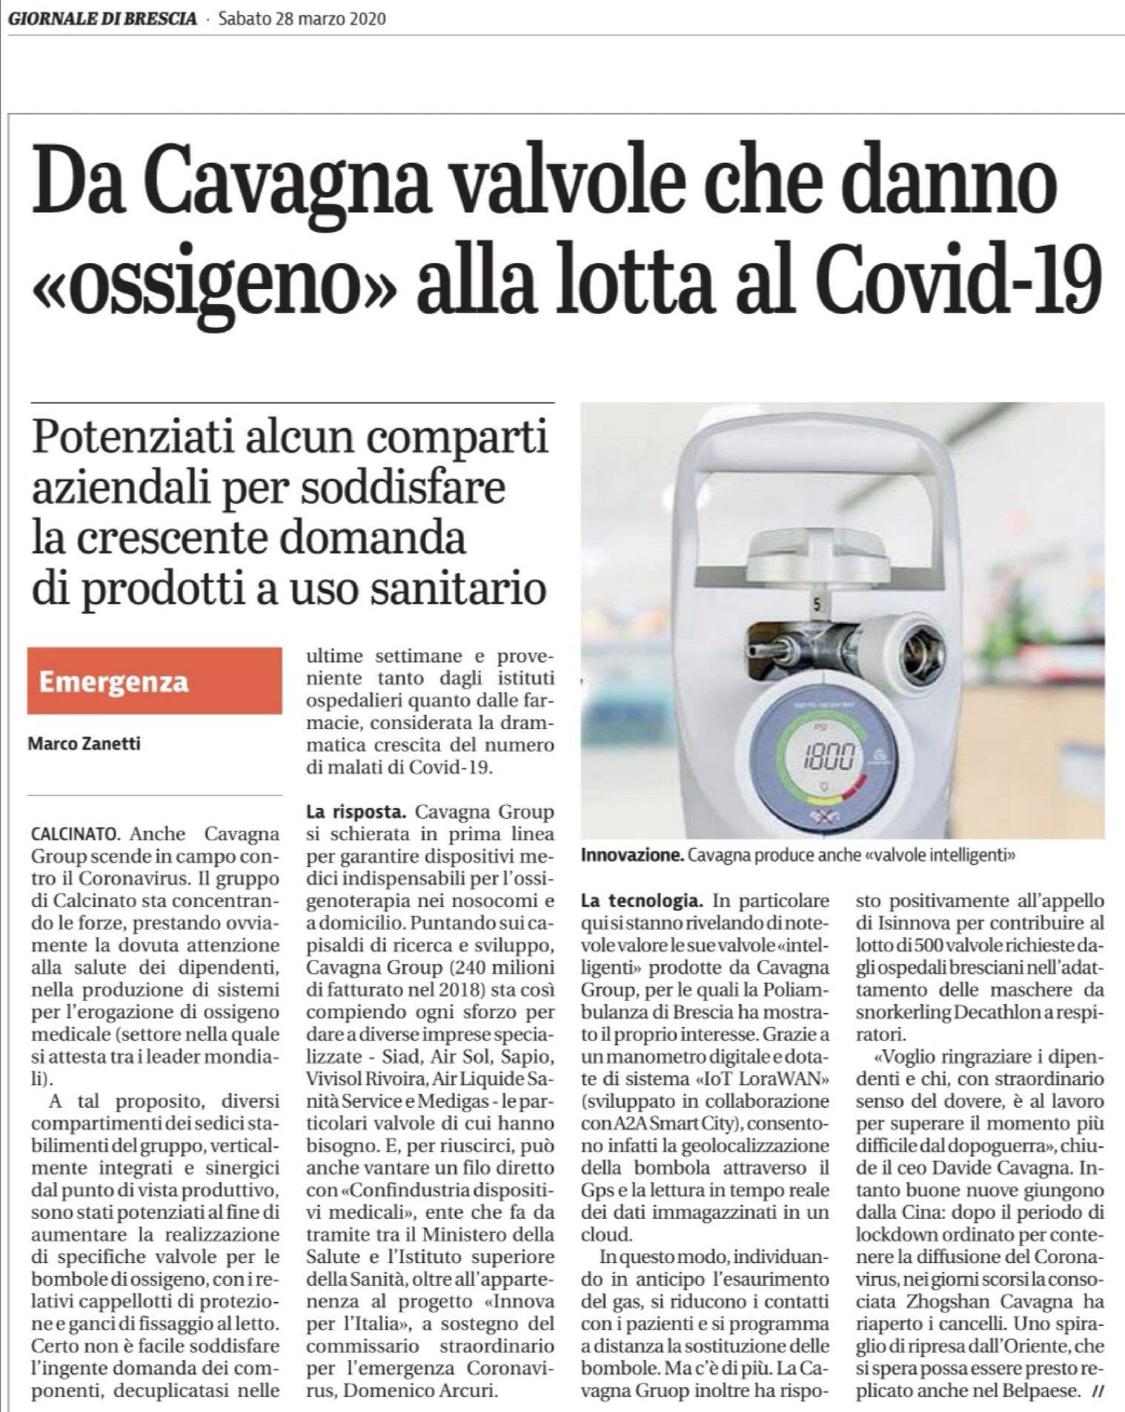 Article du journal italien